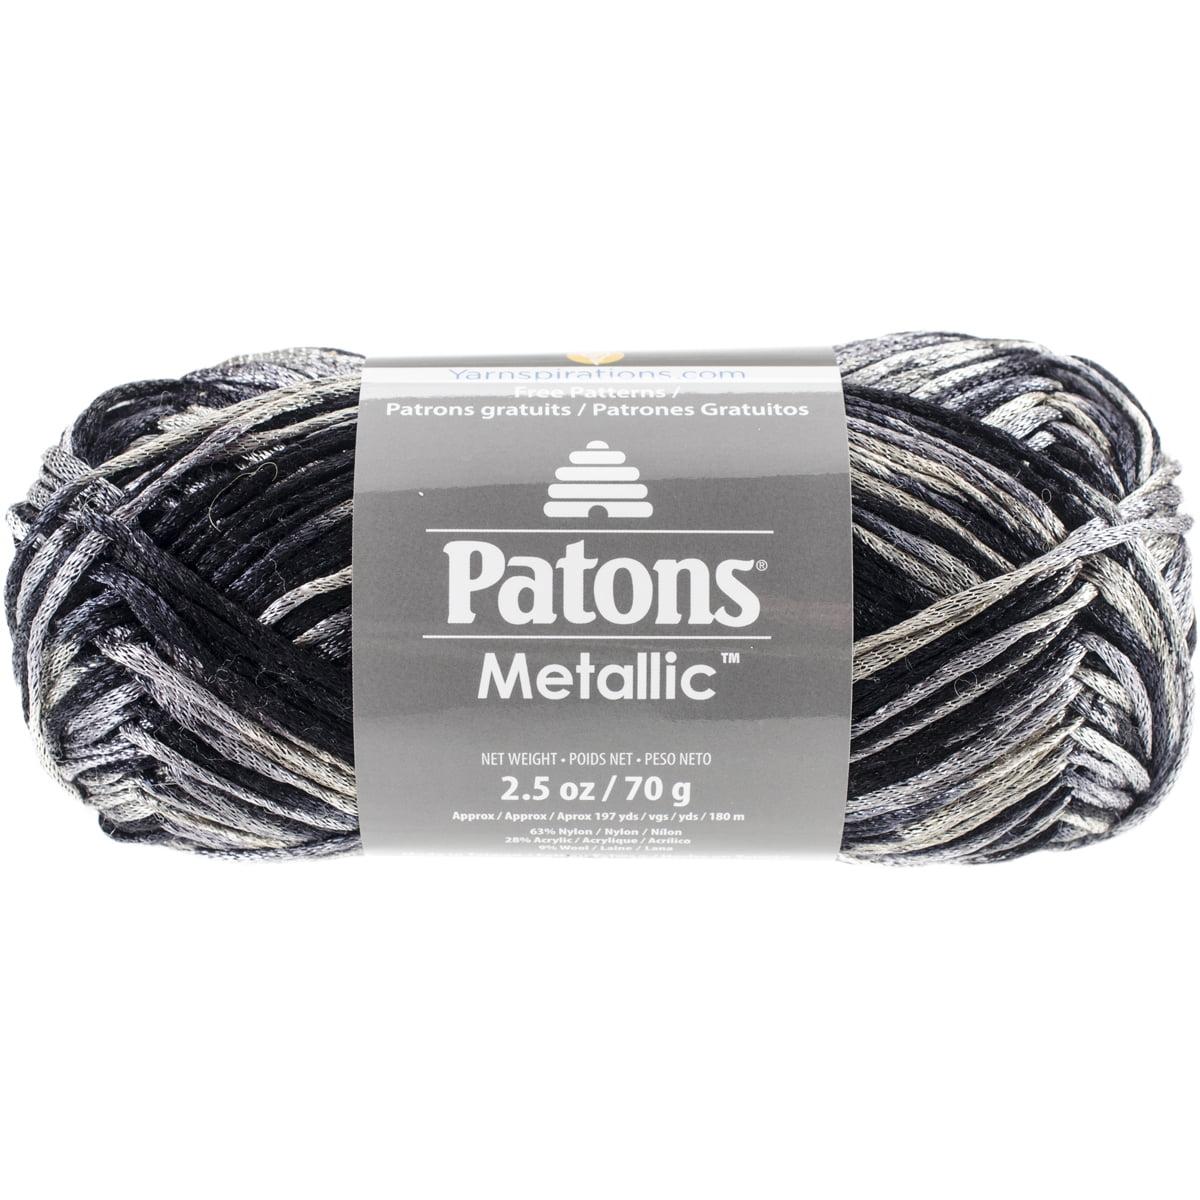 Metallic Variegated Yarn-Black Marble - Walmart.com